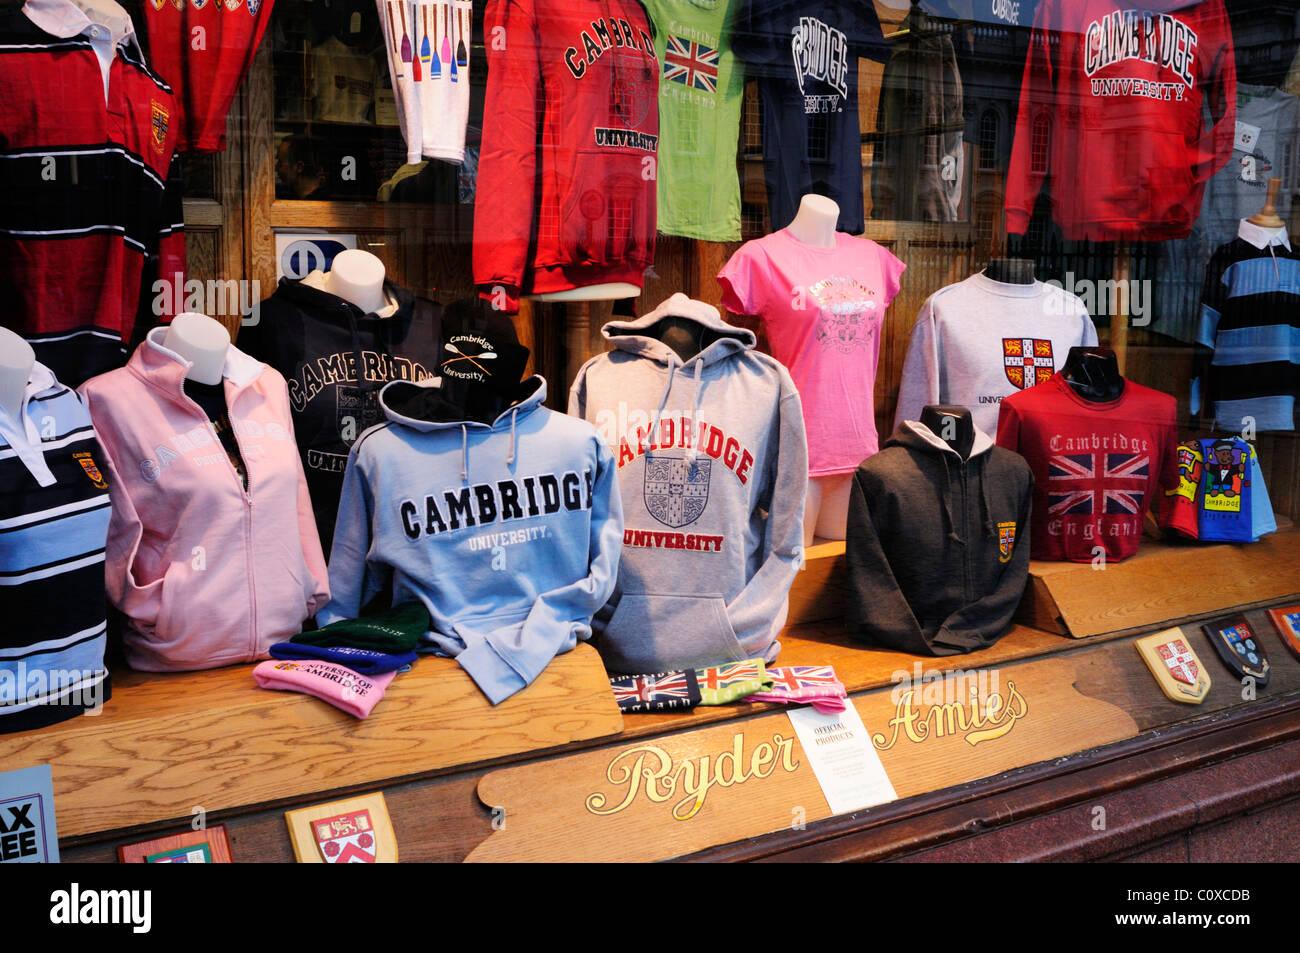 U of u clothing store